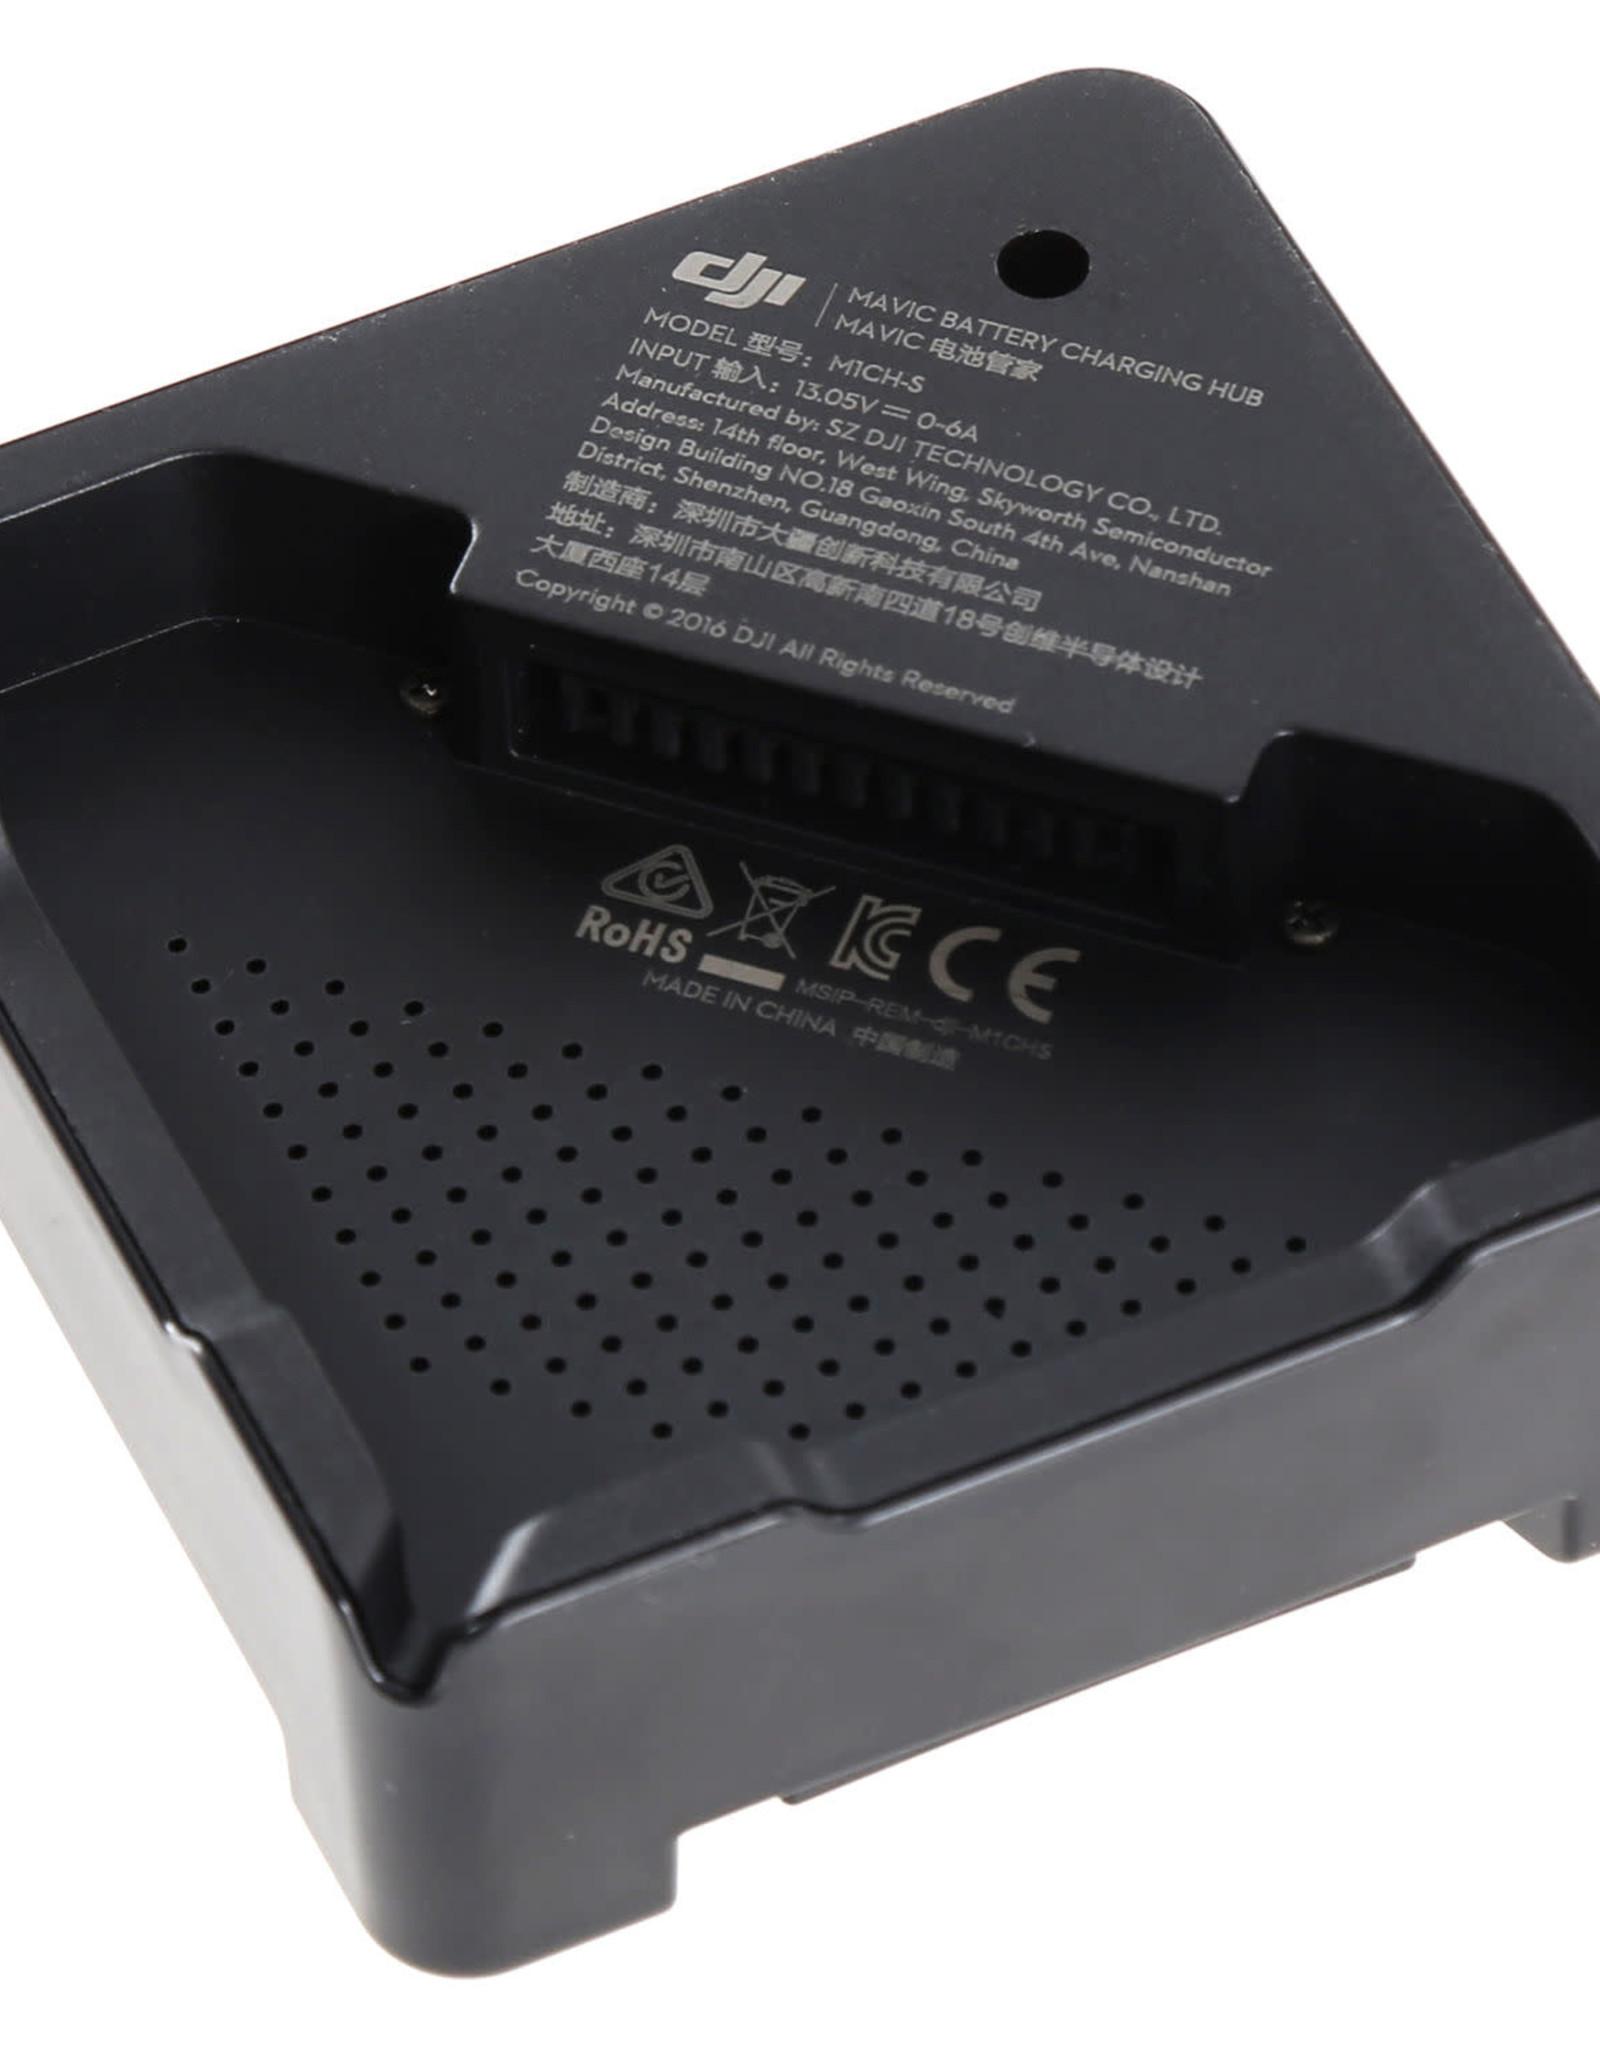 DJI DJI   Mavic Pro Battery Charging Hub Retail CP.PT.000563